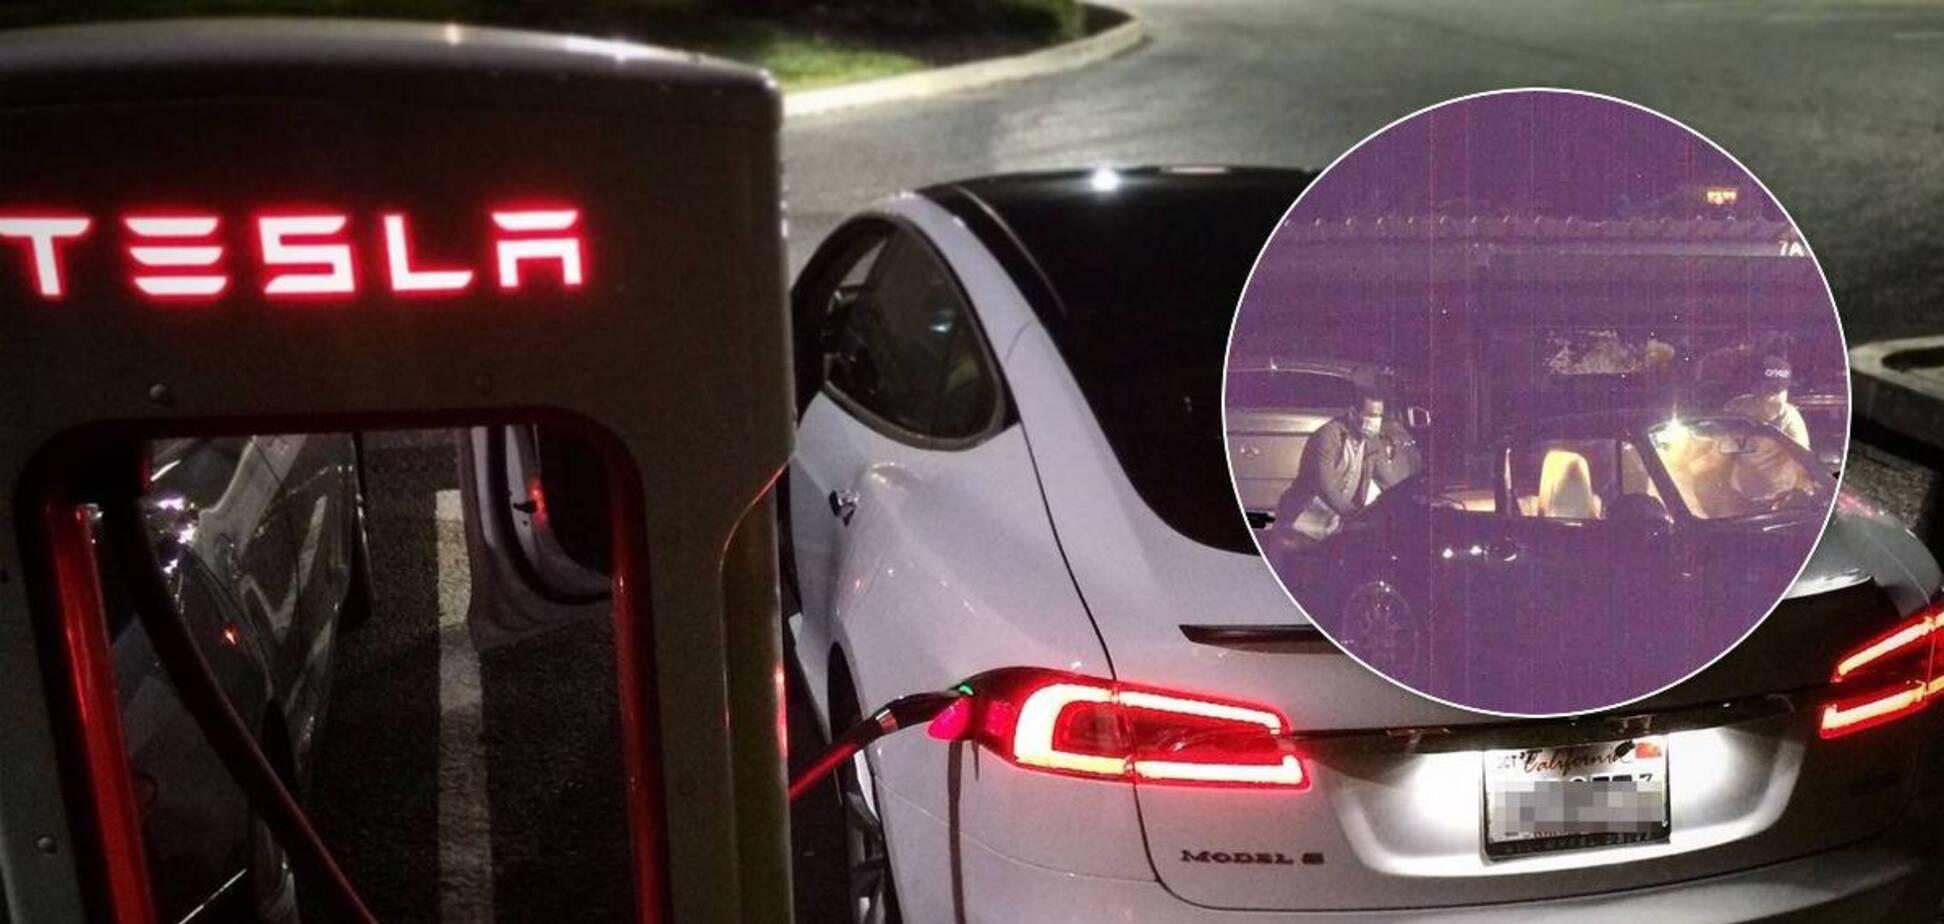 Электромобиль Tesla помог найти преступников